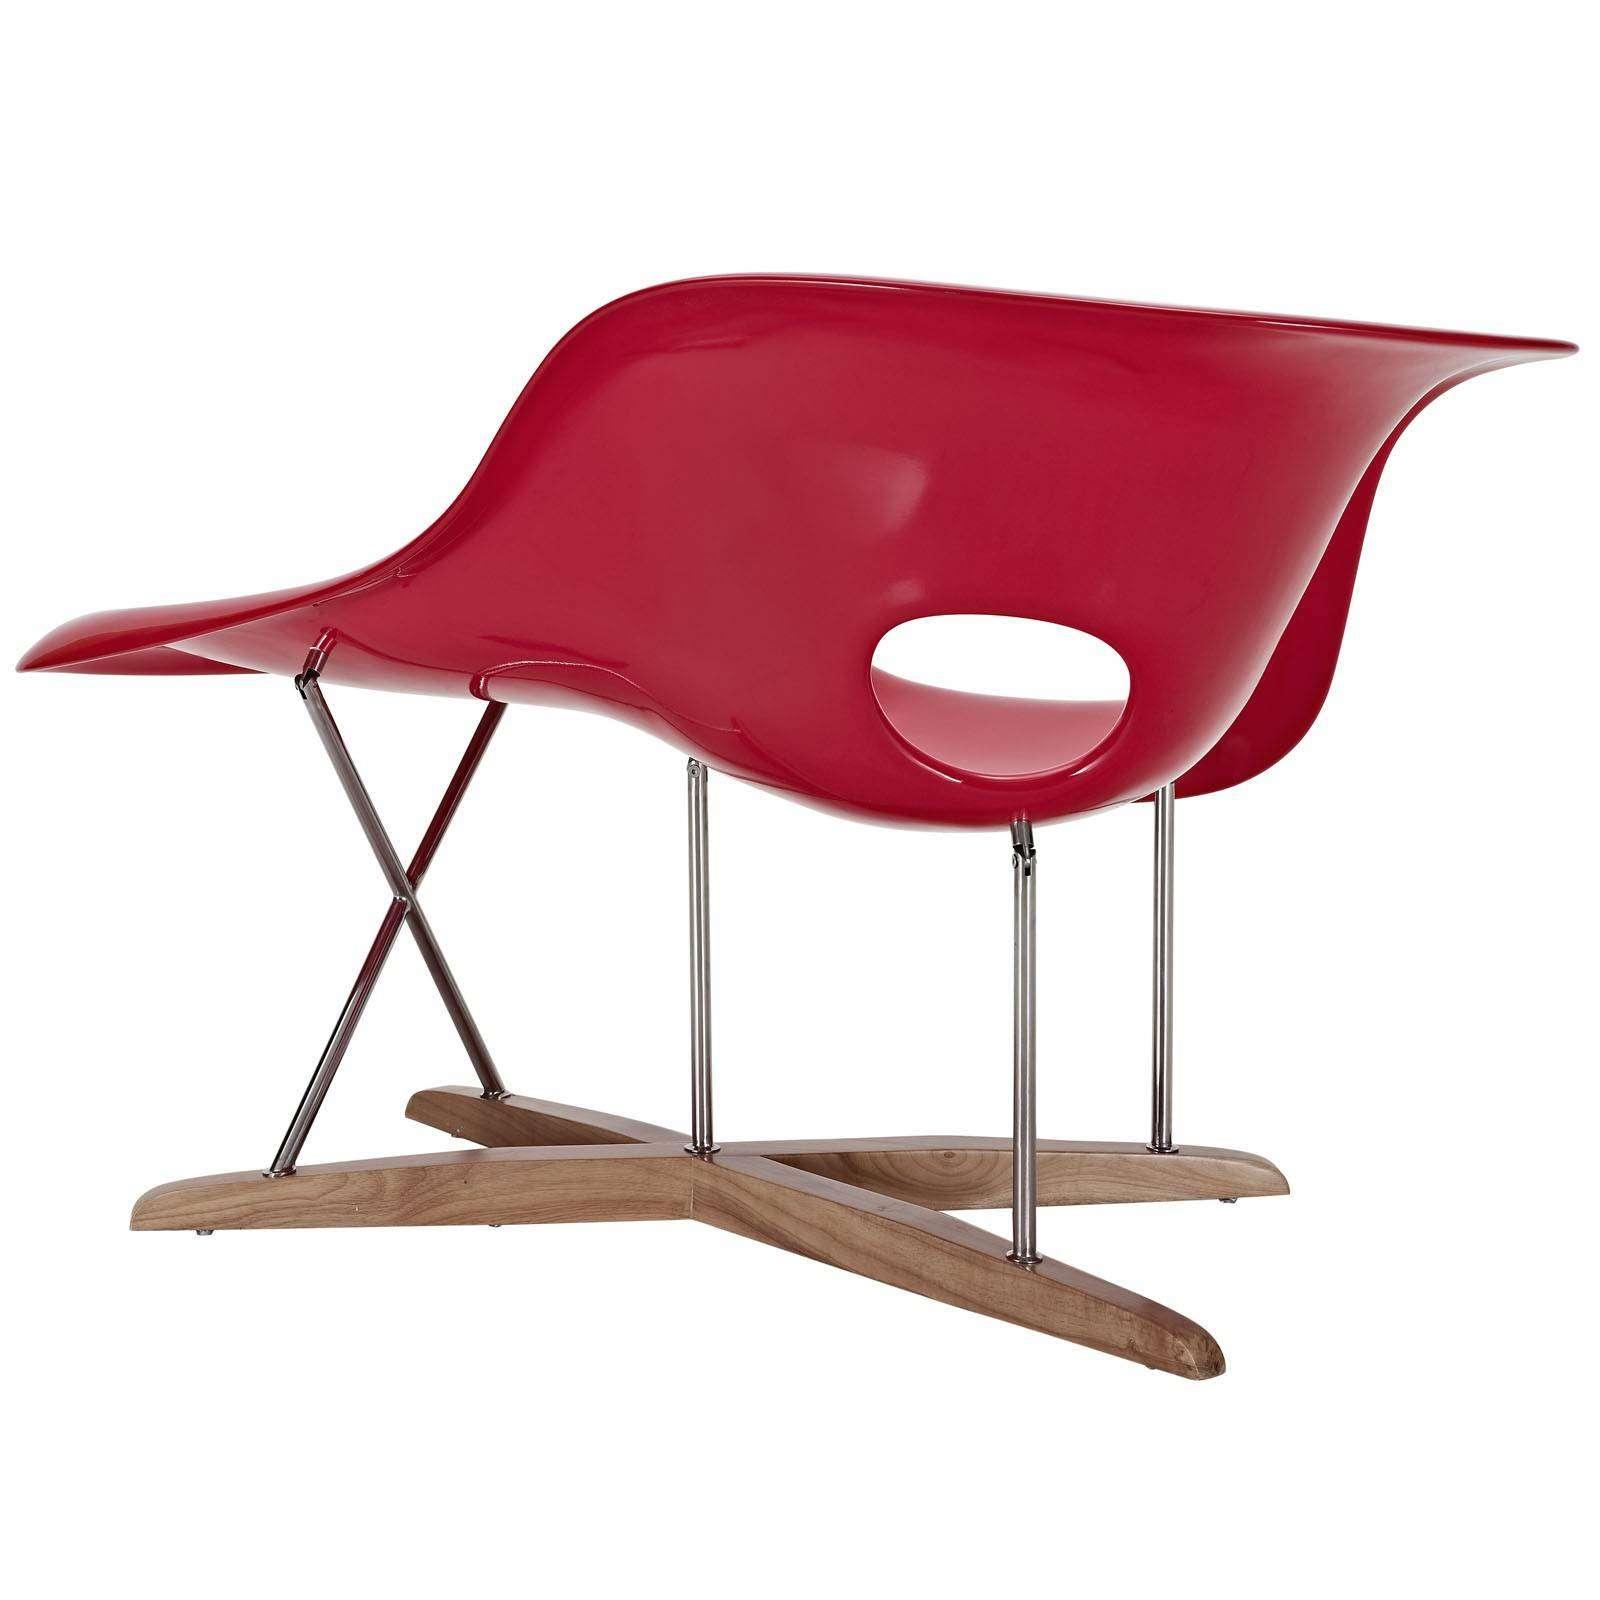 la chaise lounge chair. Black Bedroom Furniture Sets. Home Design Ideas